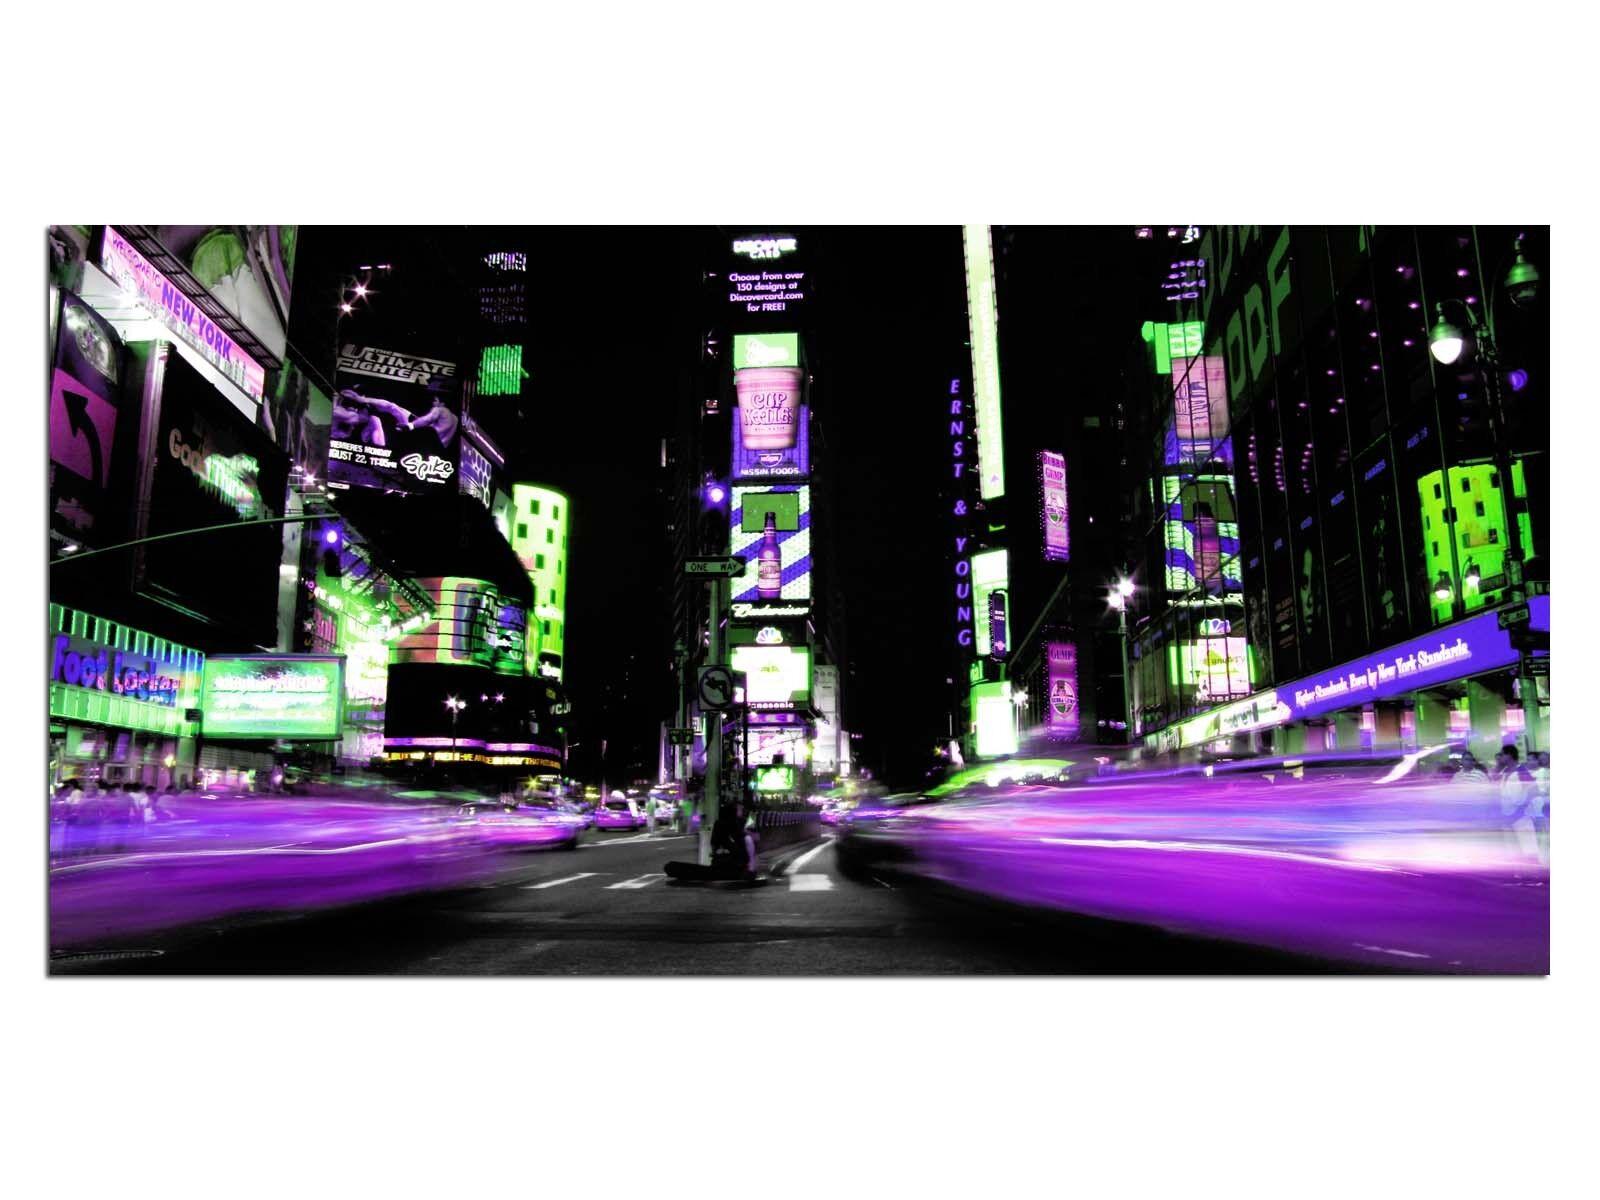 HD Glasbild EG4100500914 TIMES SQUARE NYC LILA 100 x 50 cm Wandbild STADT